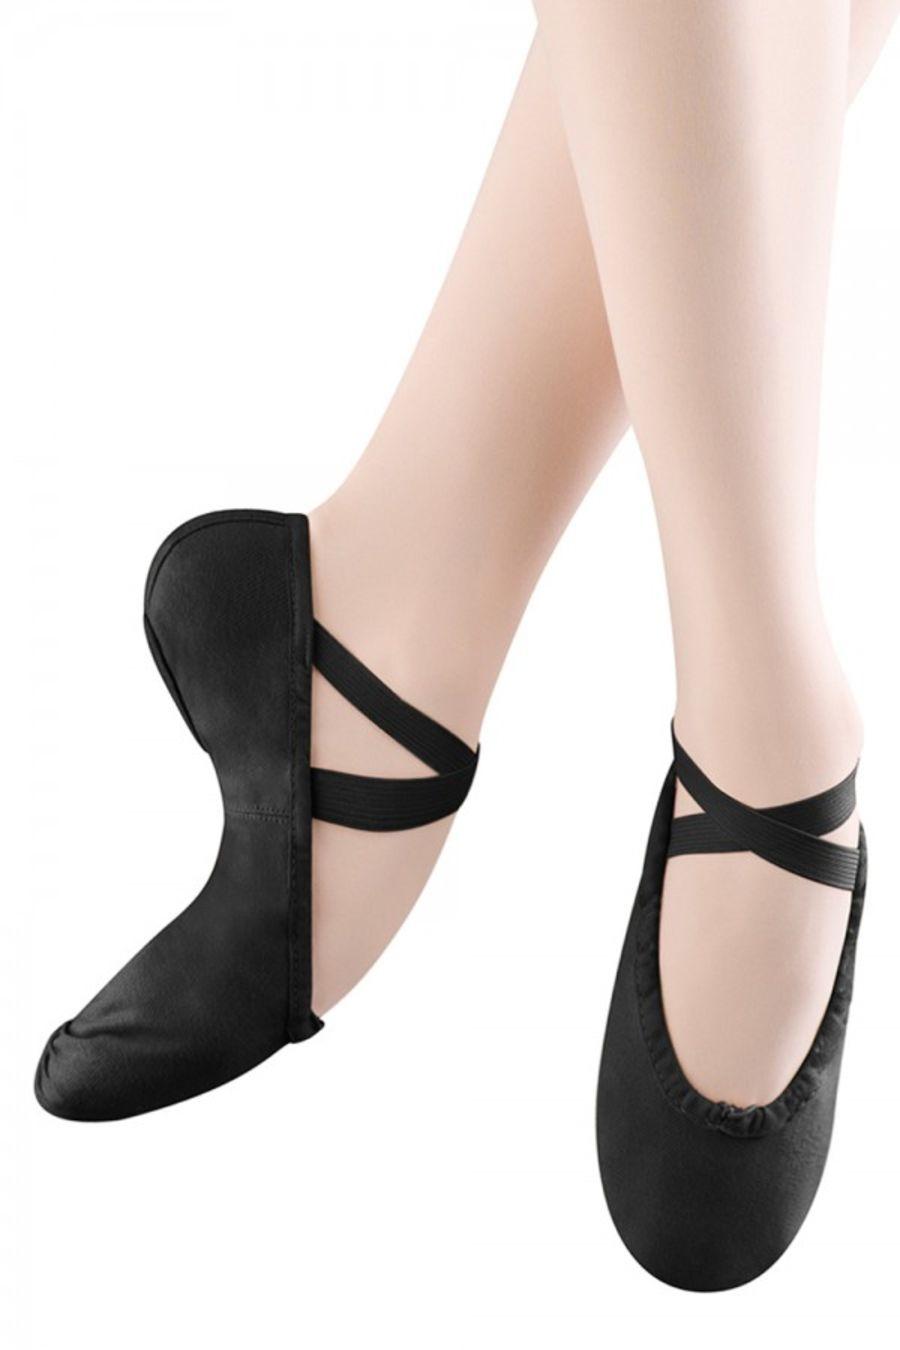 Bloch Pump SO277L Black Canvas Split sole Ballet/Dance shoe in Black